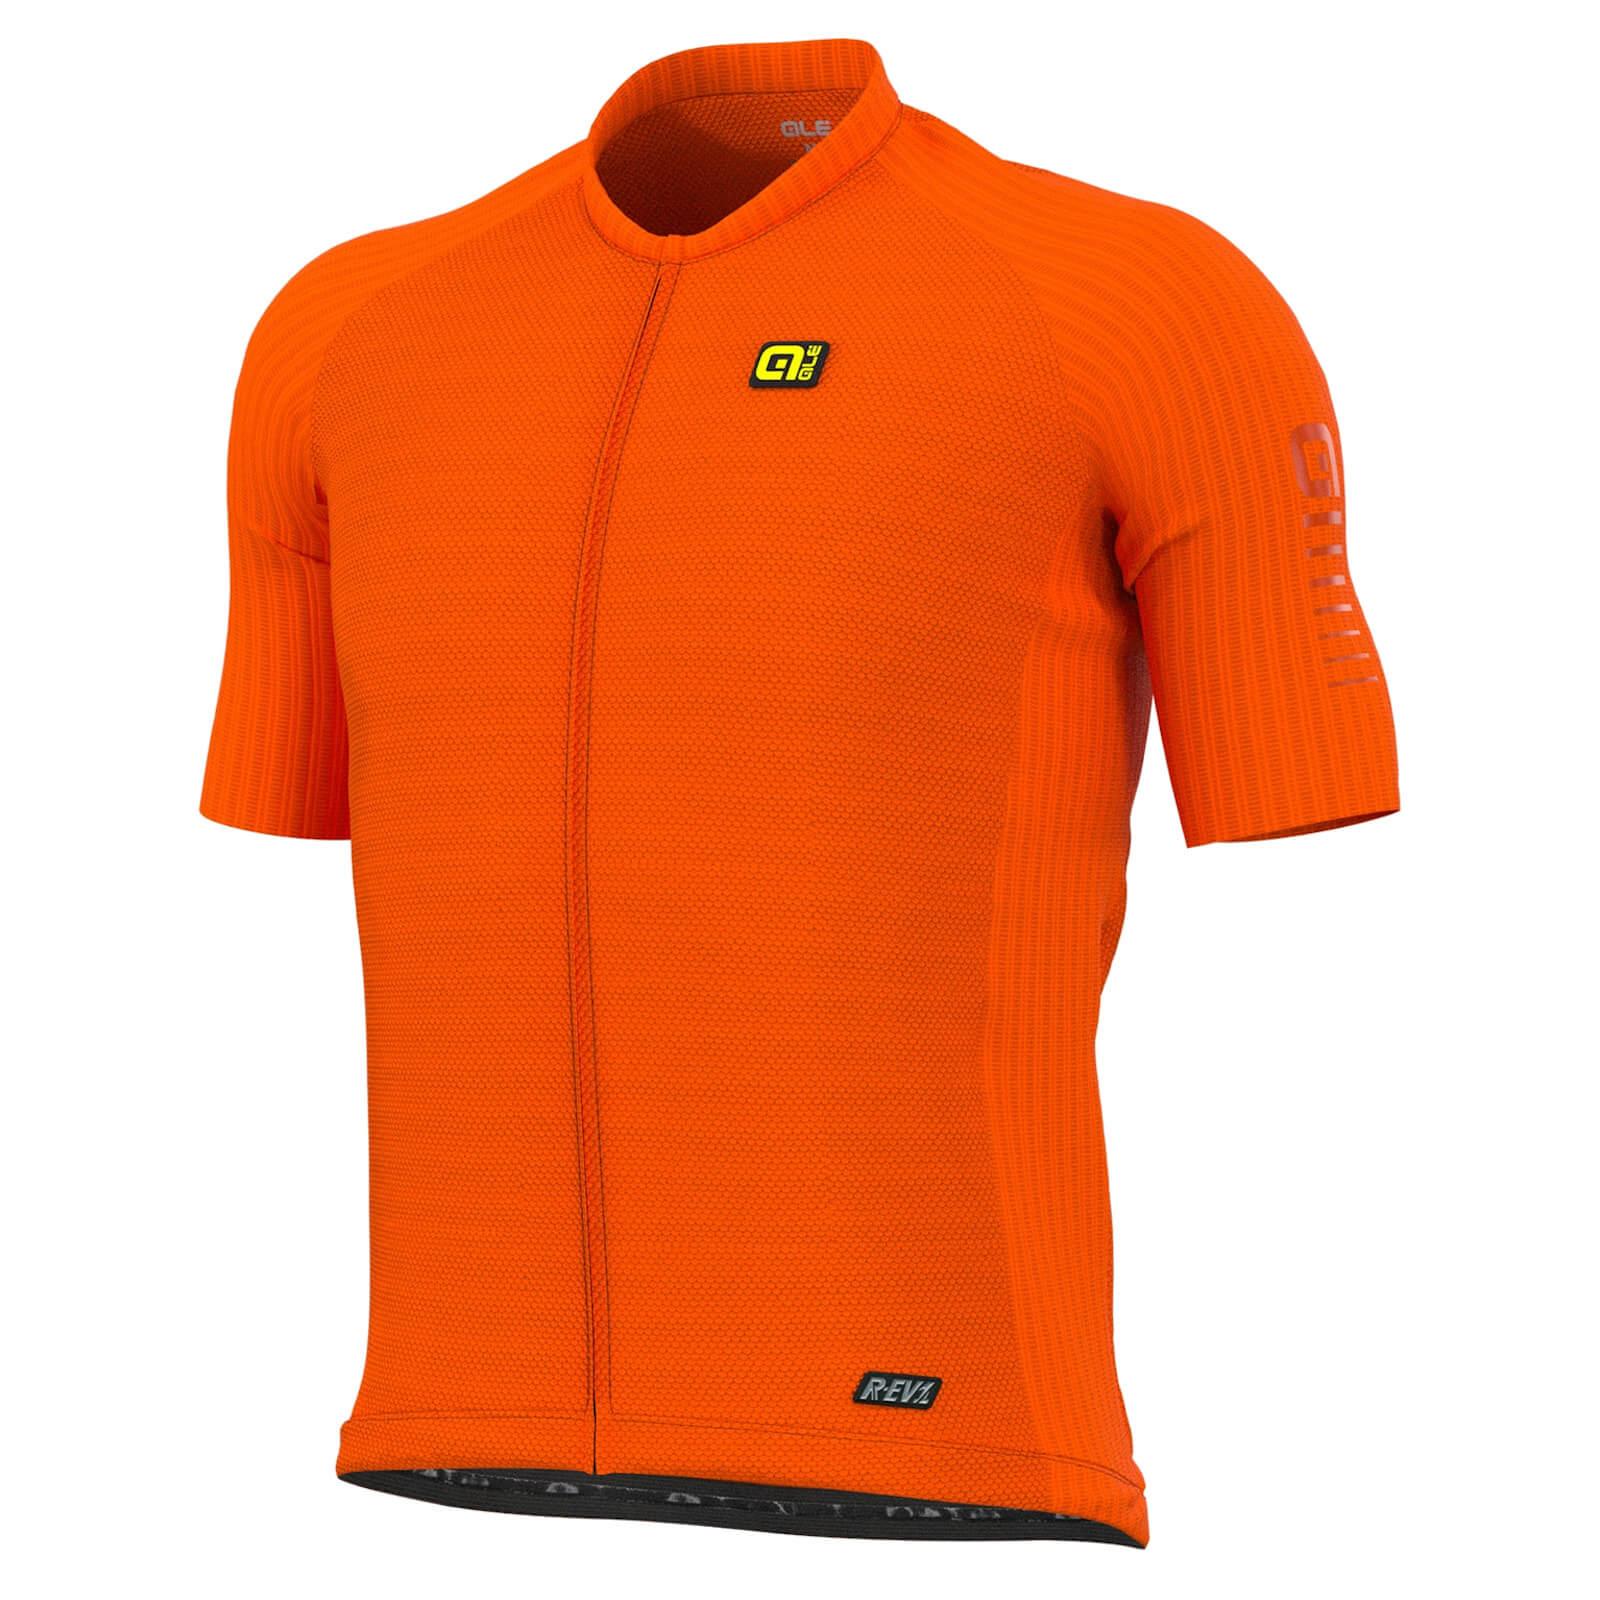 Ale R-EV1 Silver Cooling Jersey - S - Fluo Orange